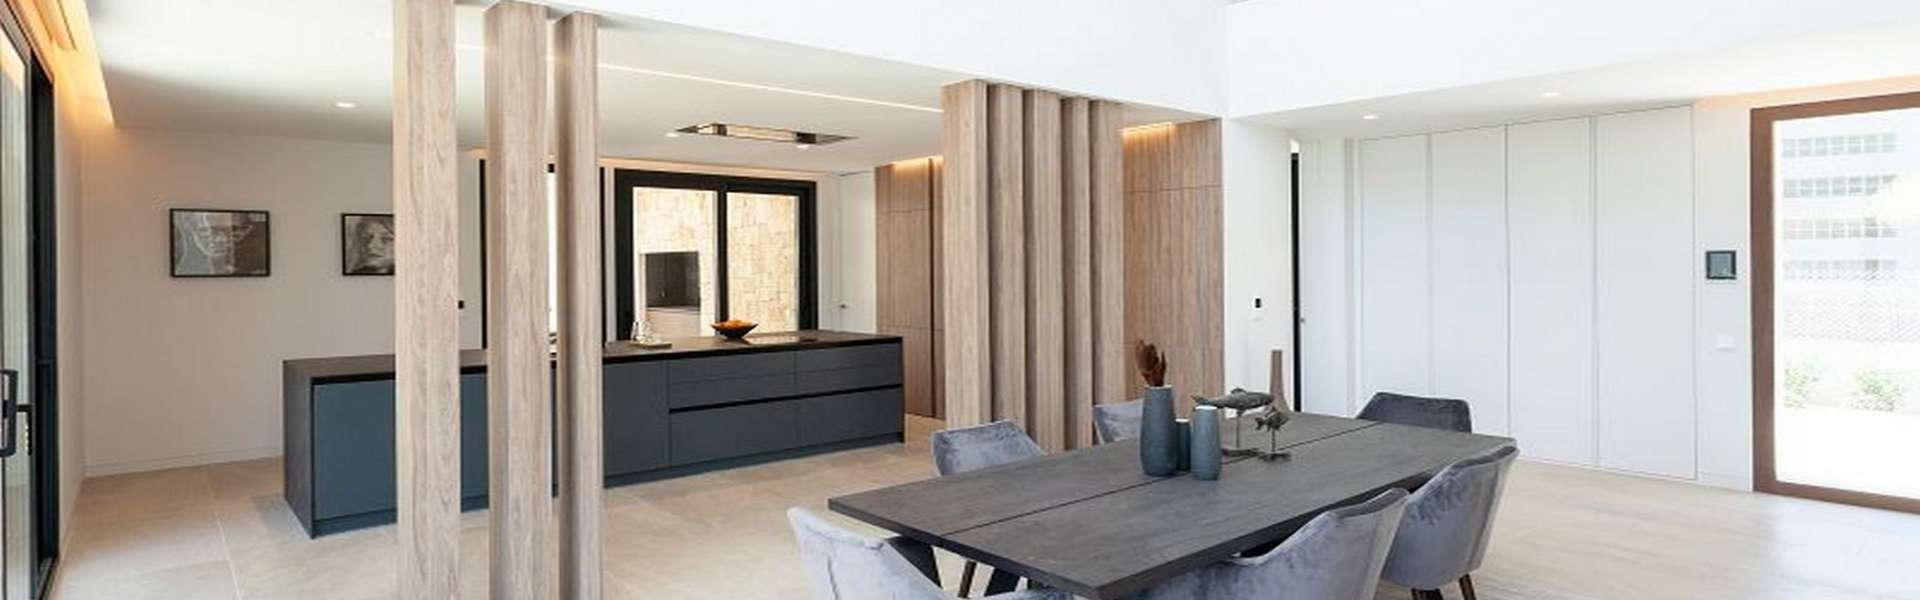 Santa Ponsa - Stylish Villa in exclusive location